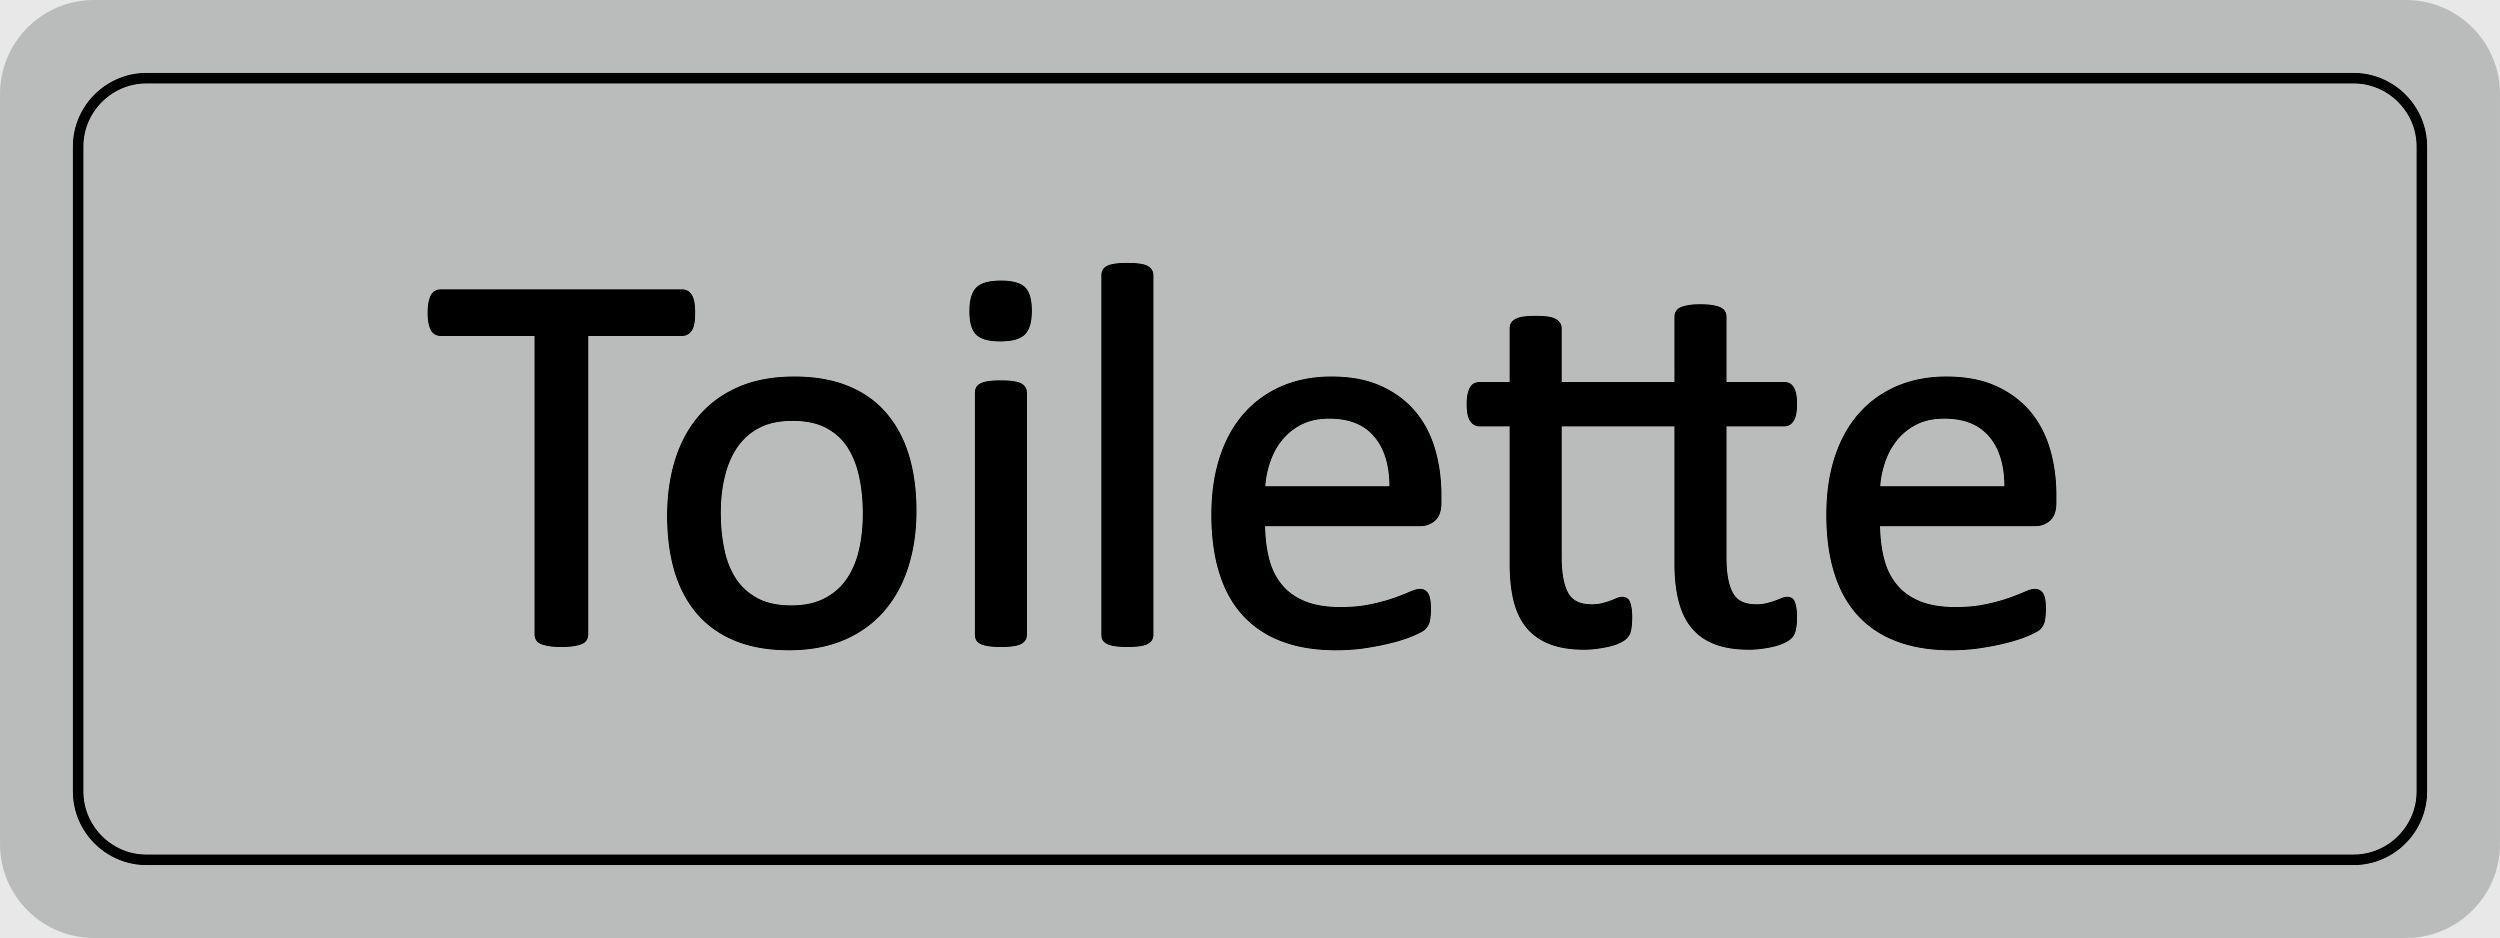 Türschild Toilette selbstklebend 45 x 120 mm – Bild 1